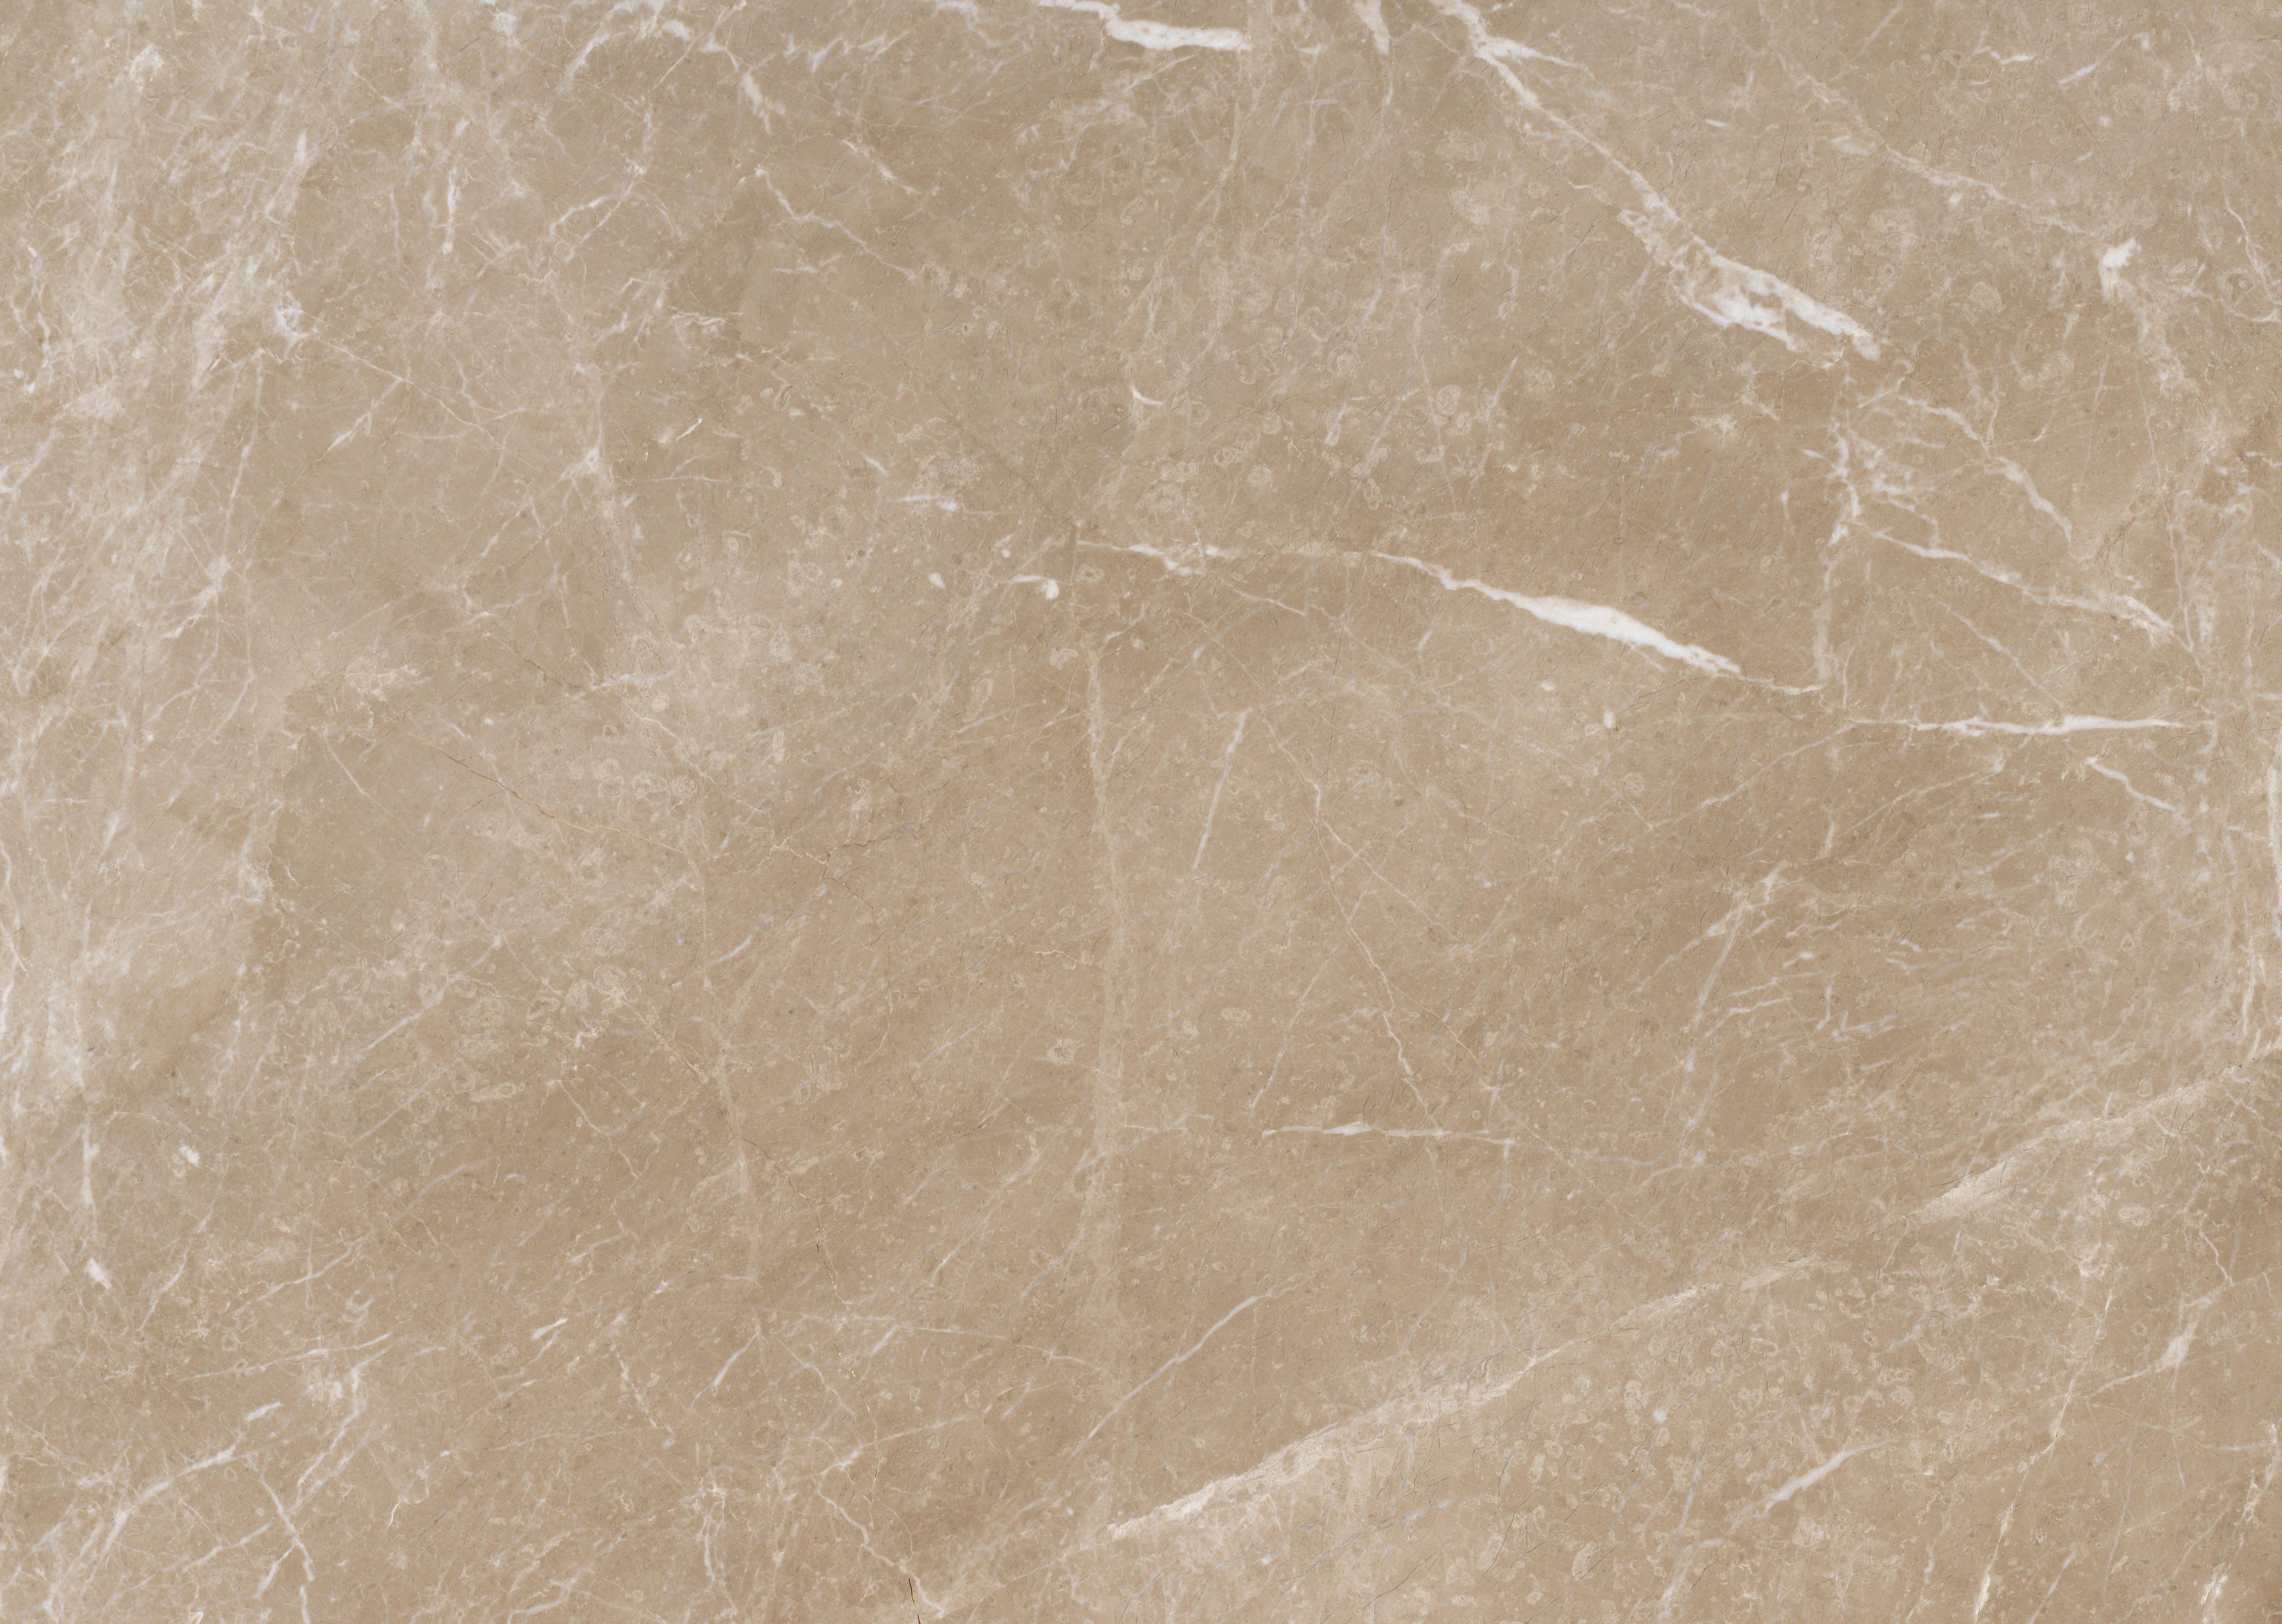 Armani Cream Variation 2 Beige Marble Beige Marble Beige Marble Tile Marble